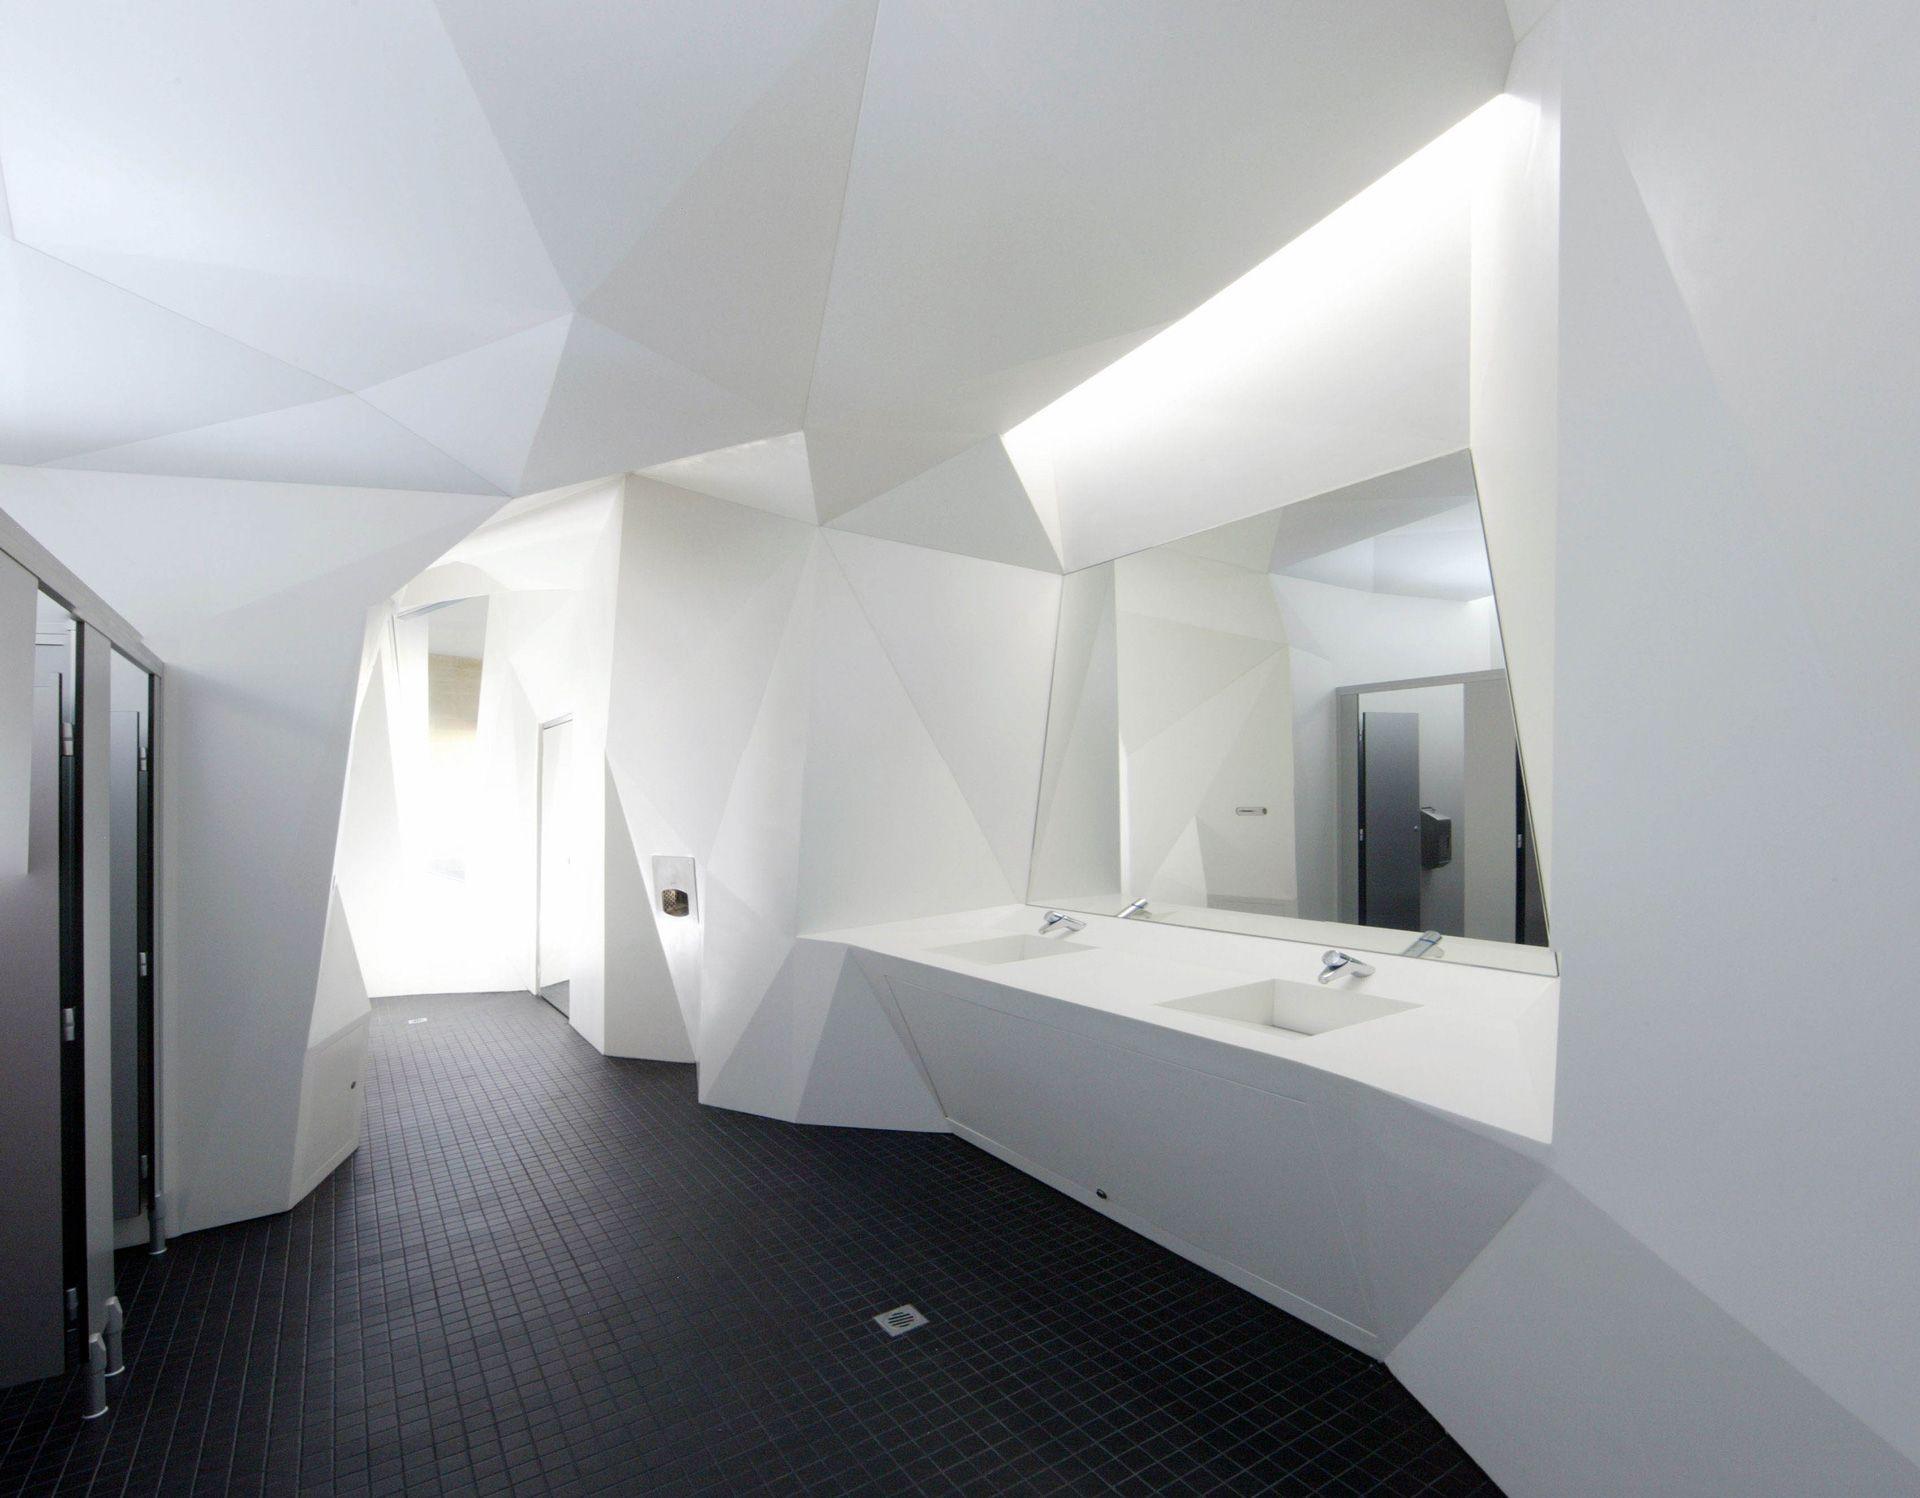 Perth Cultural Centre Precinct | Corian | Bathroom design ...